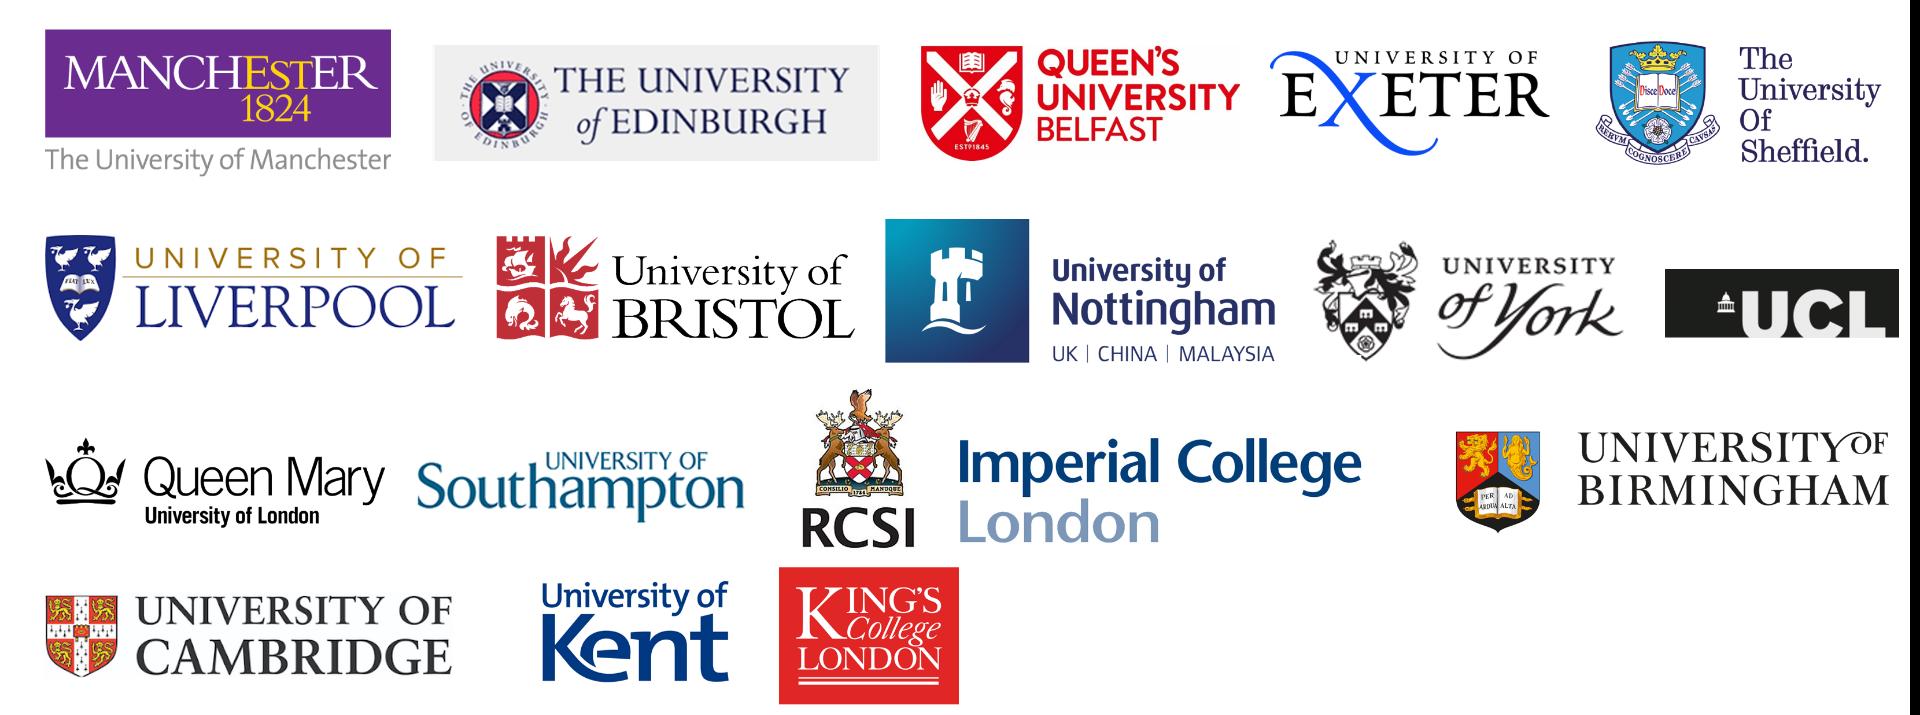 Event Partners - University Hospitals Birmingham NHS Foundation Trust & University of Birmingham